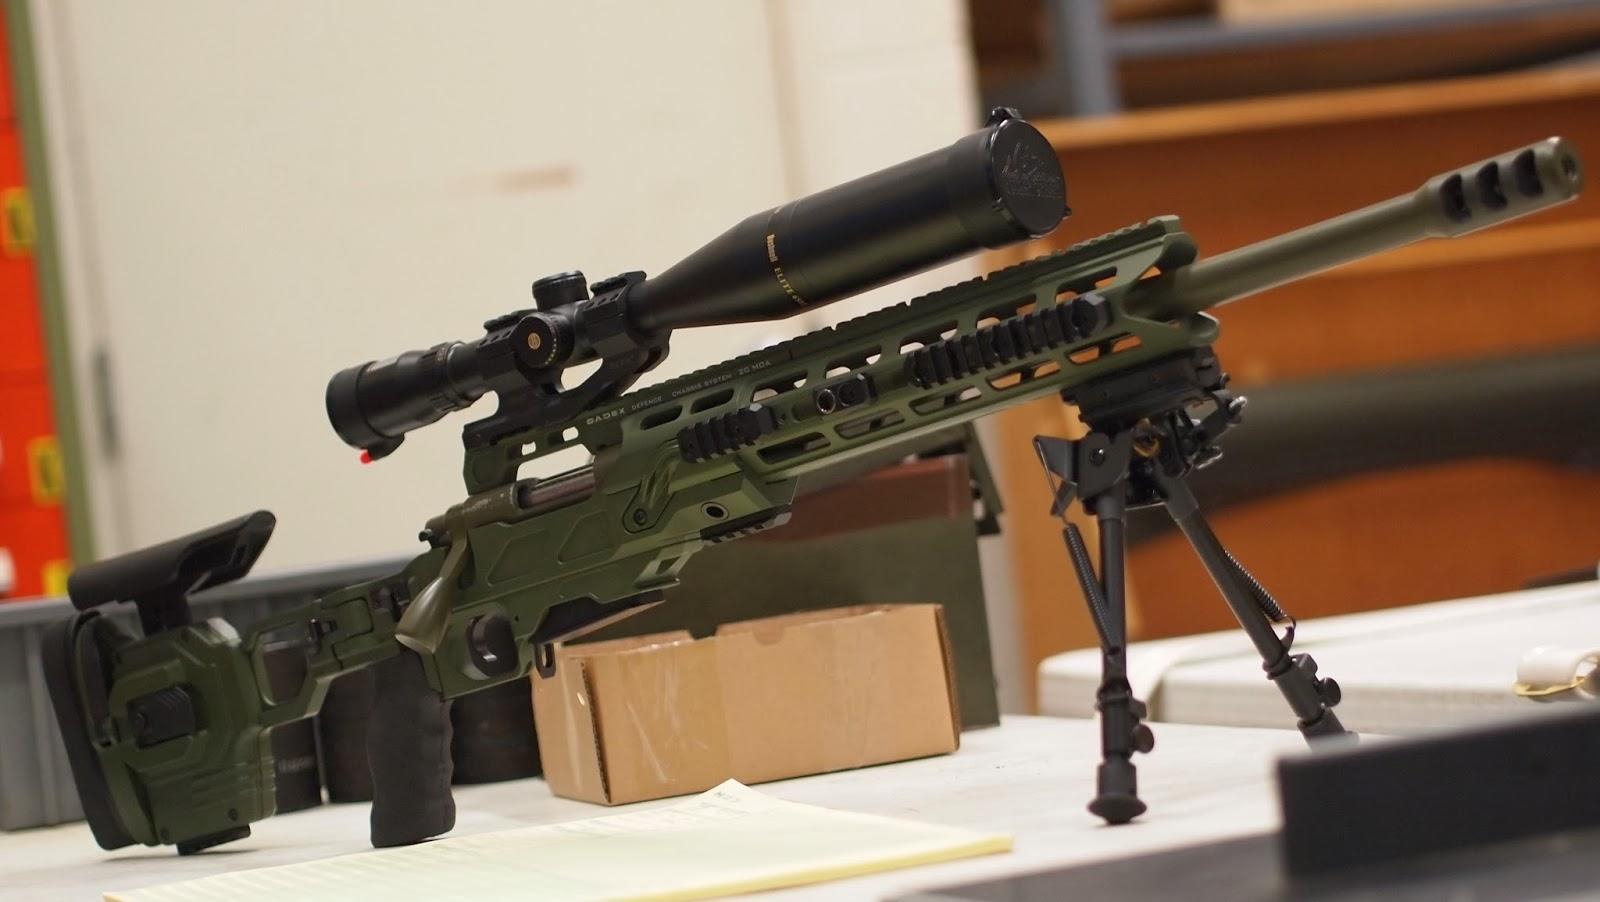 Mister Donut's Firearms Blog: Cadex 700